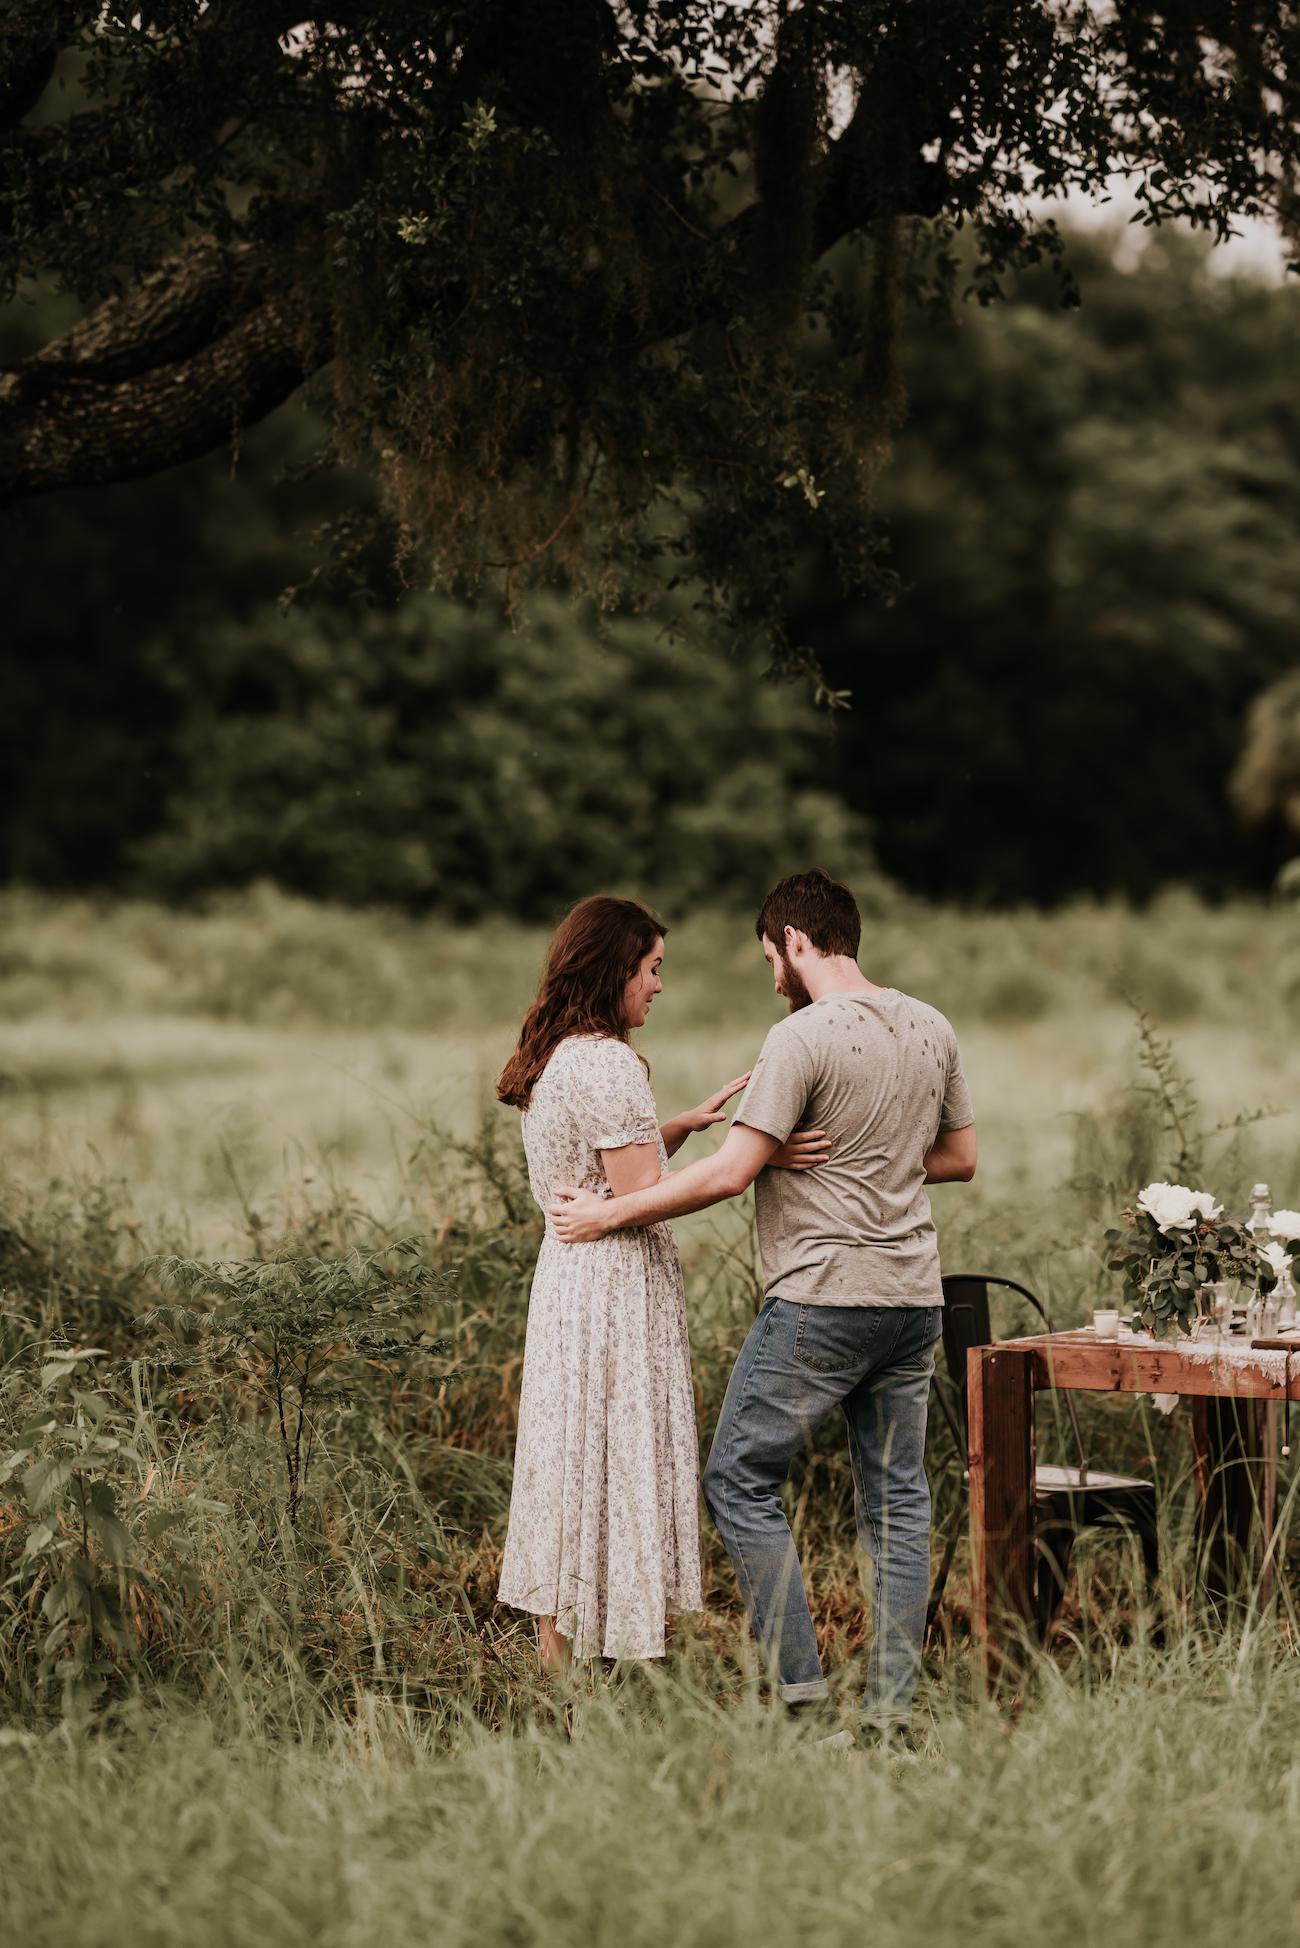 tampa-engagement-proposal-photography-76.jpeg